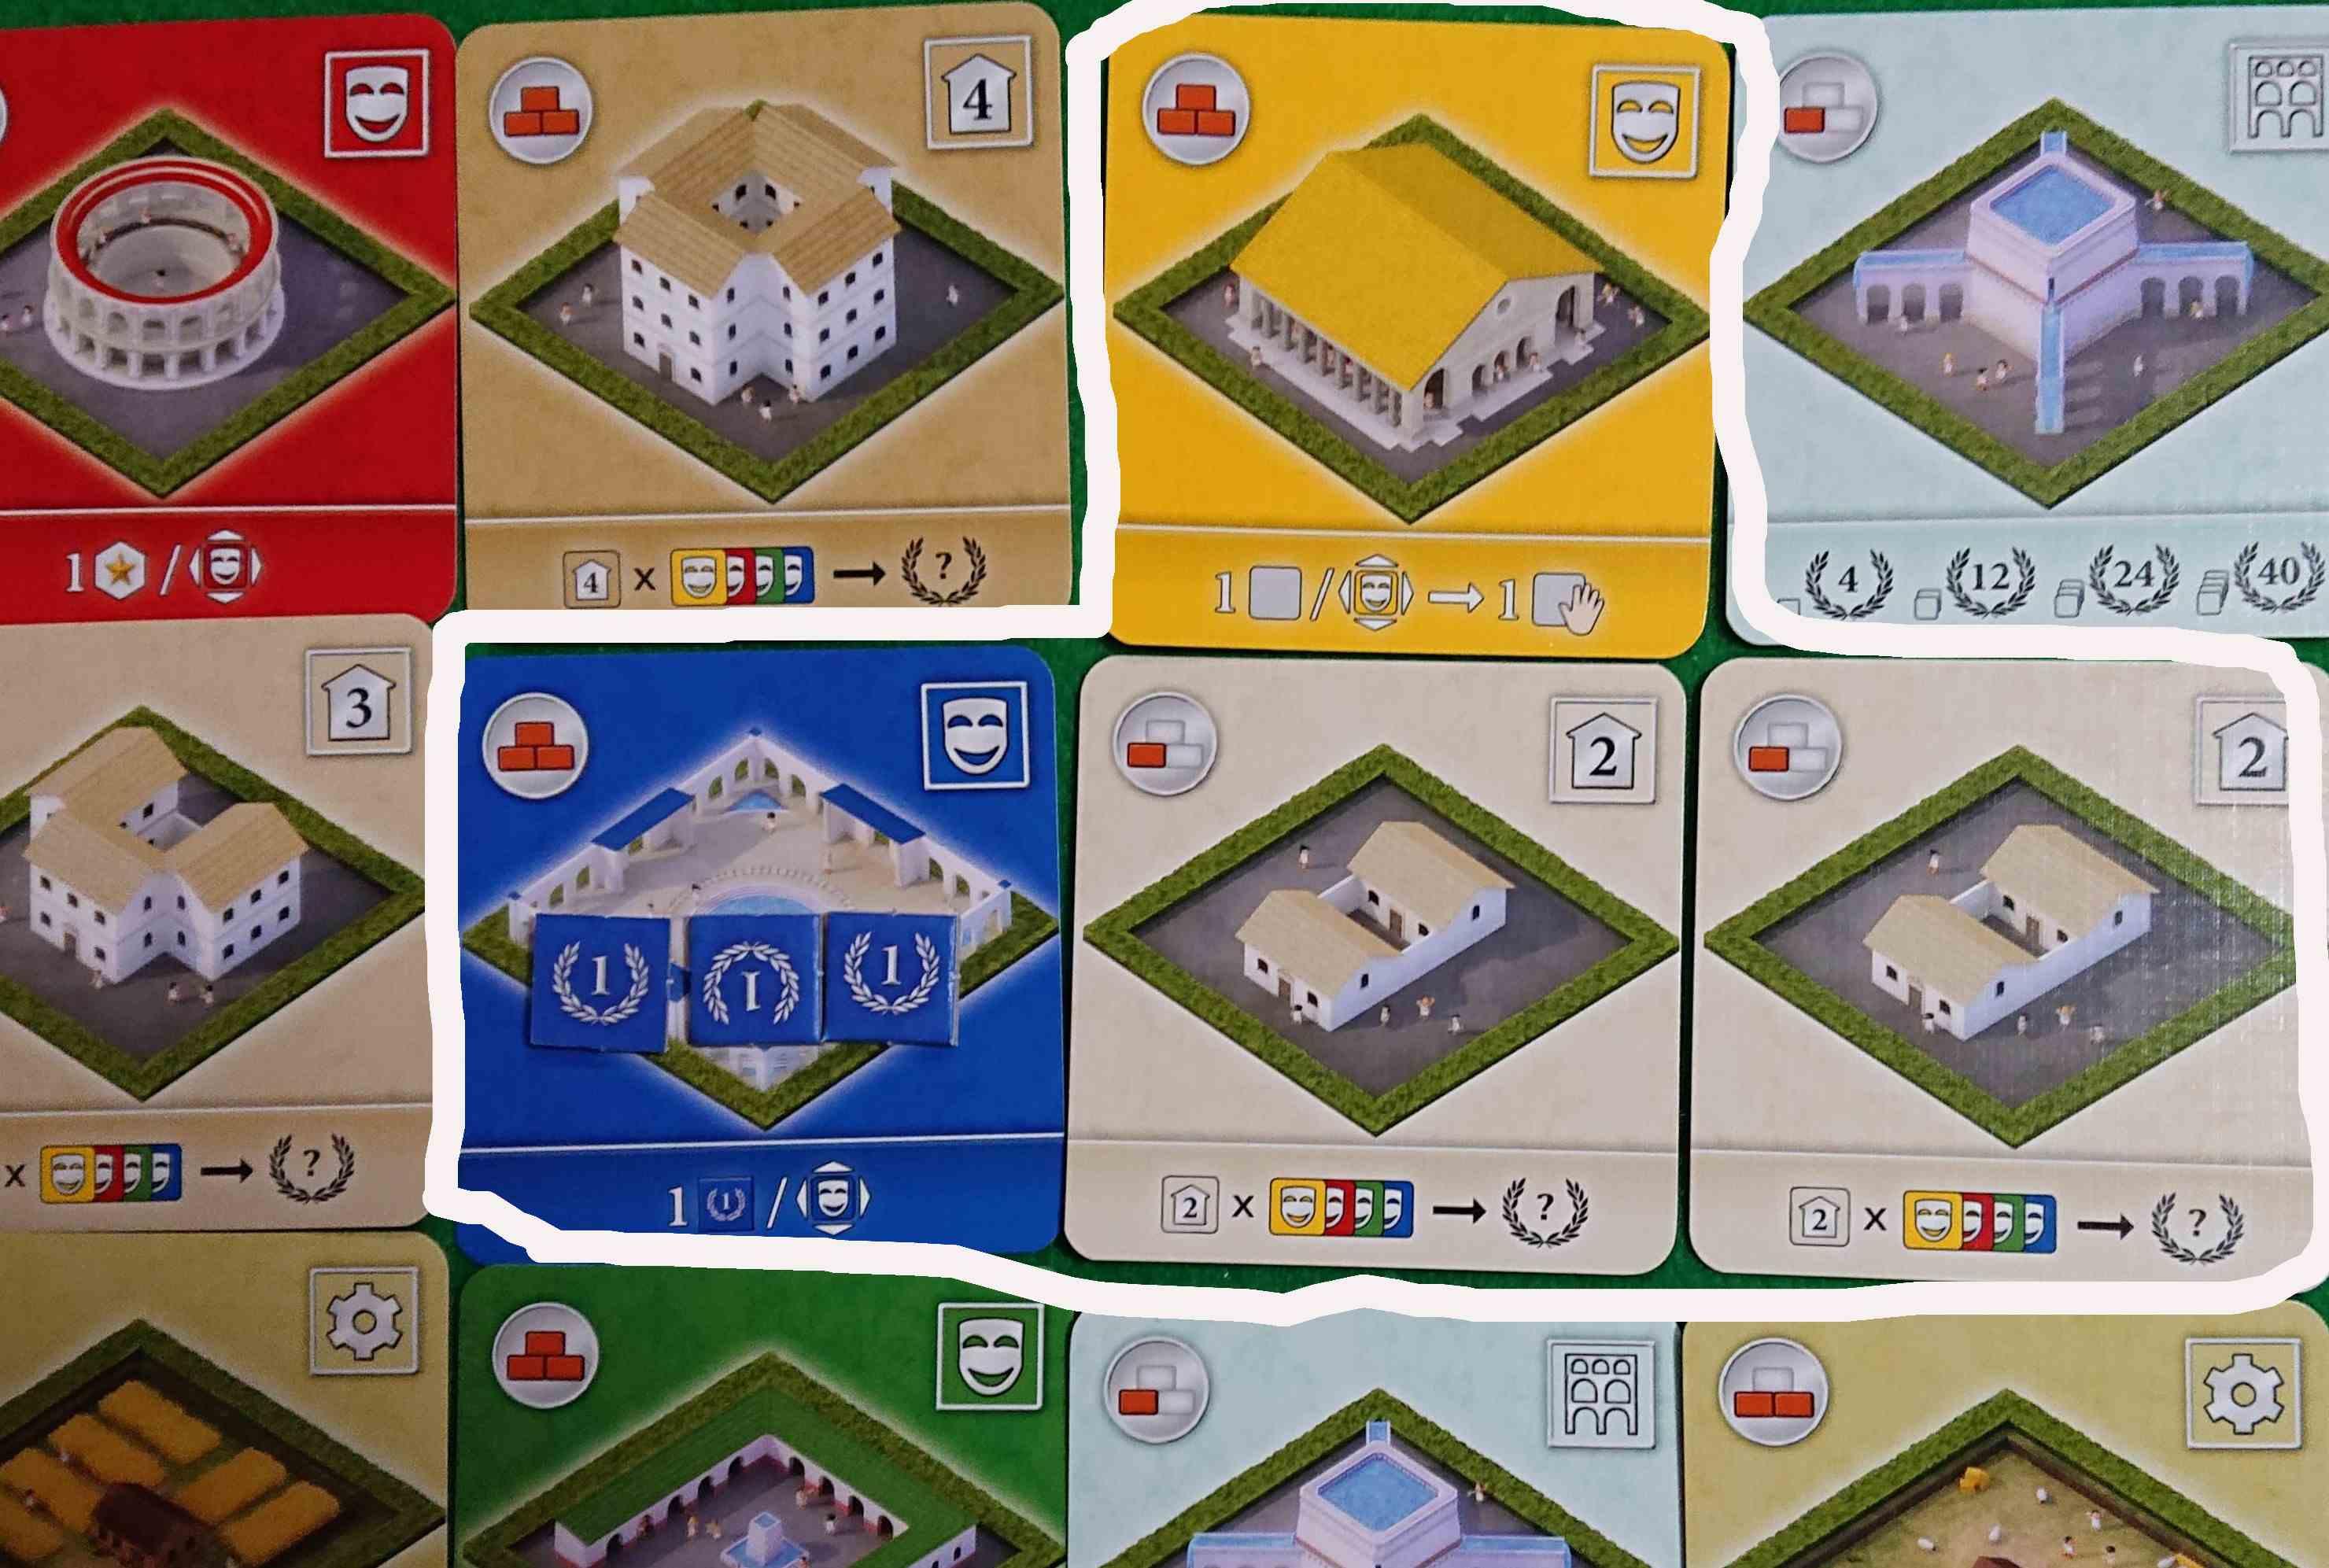 CITY OF ROME(シティオブローマ)後編 2018年スカウトアクション1位 ルール説明と感想 ボードゲーム